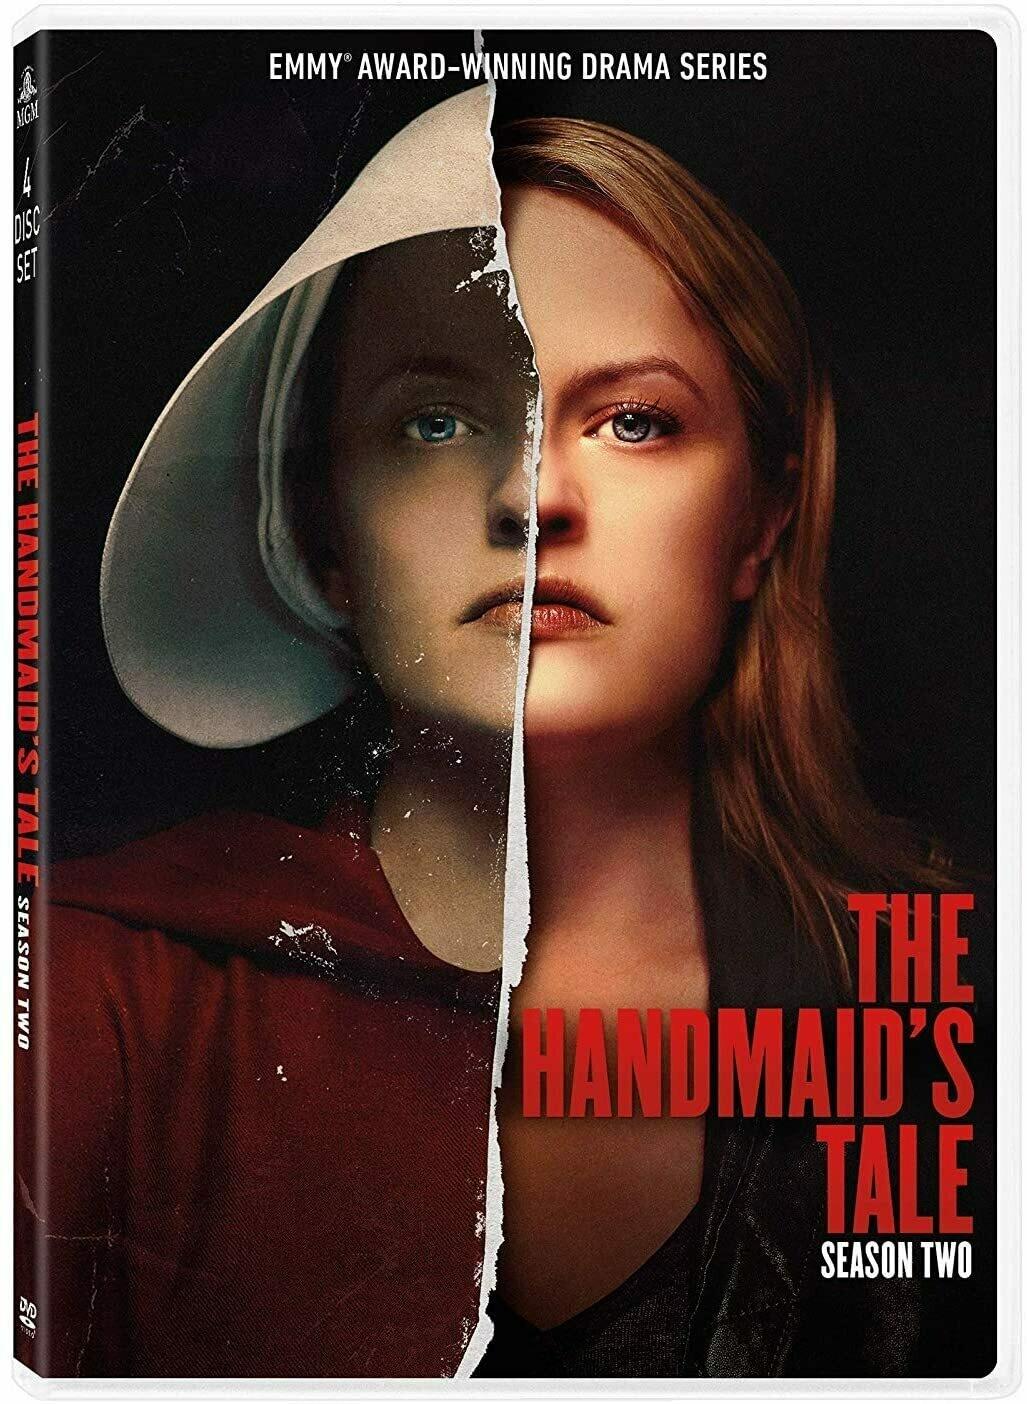 Handmaid's Tale Season Two  (7 day rental)